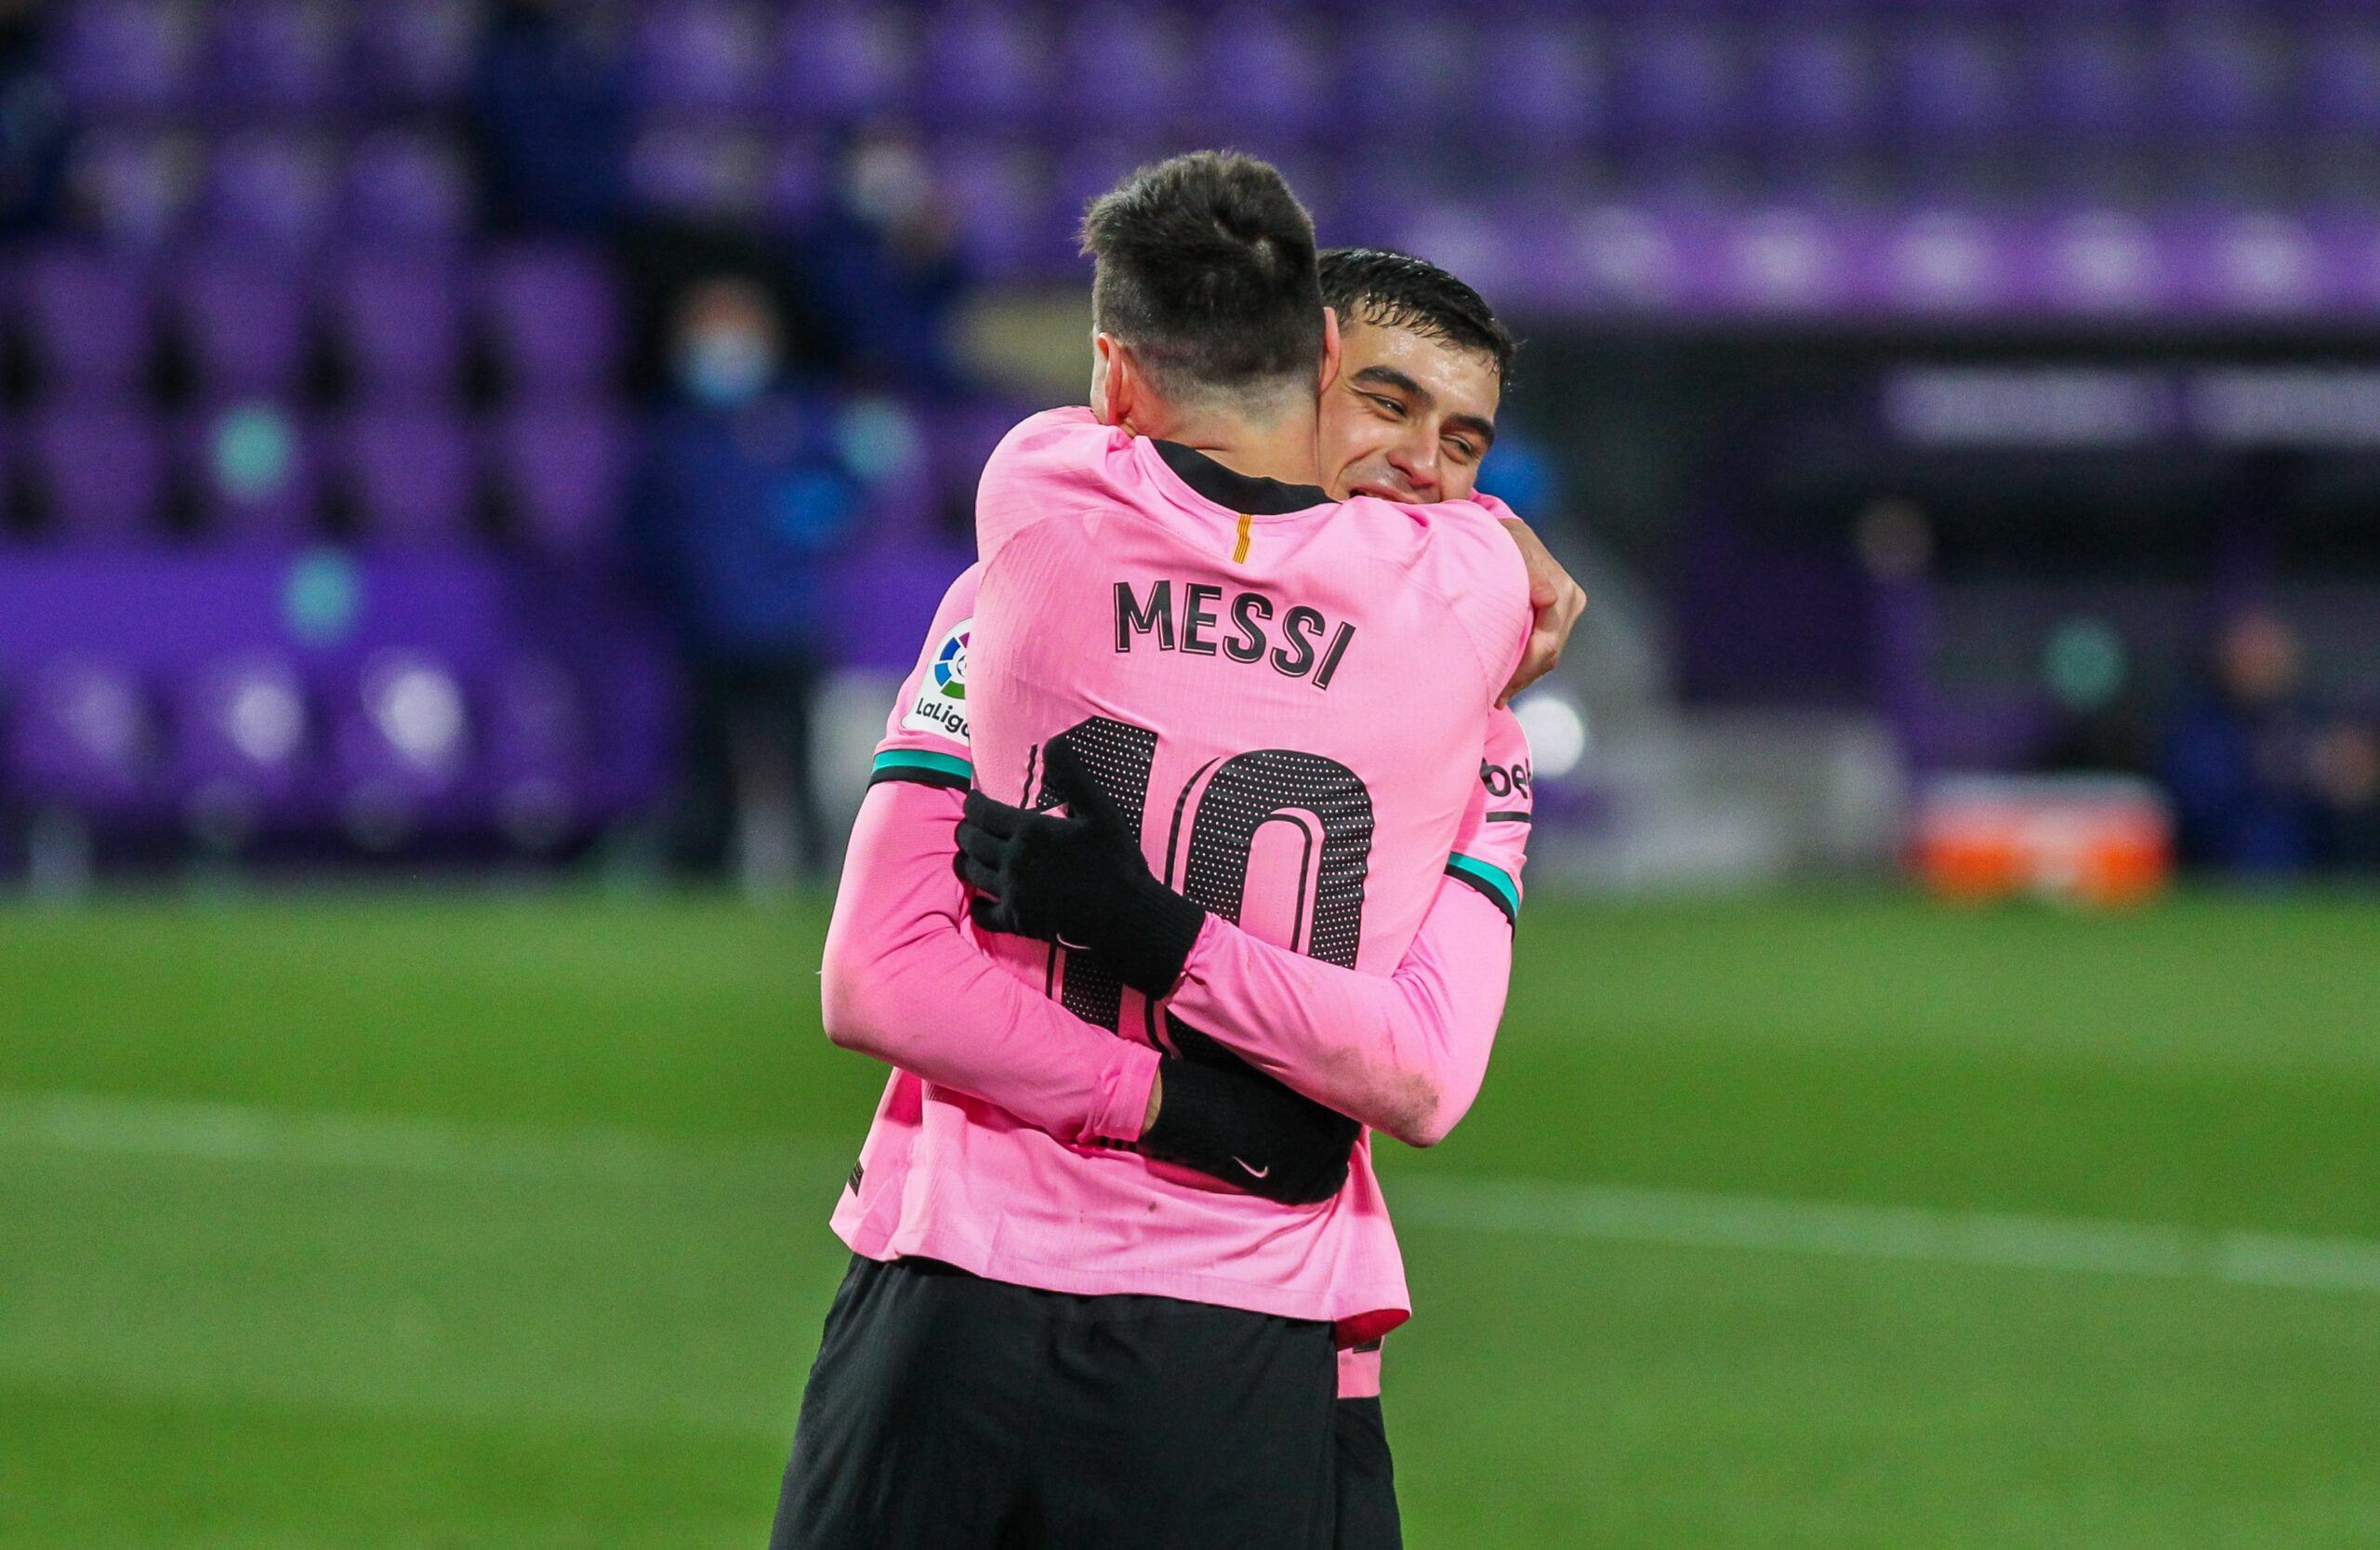 Messi i Pedri s'abracen |Europa Press